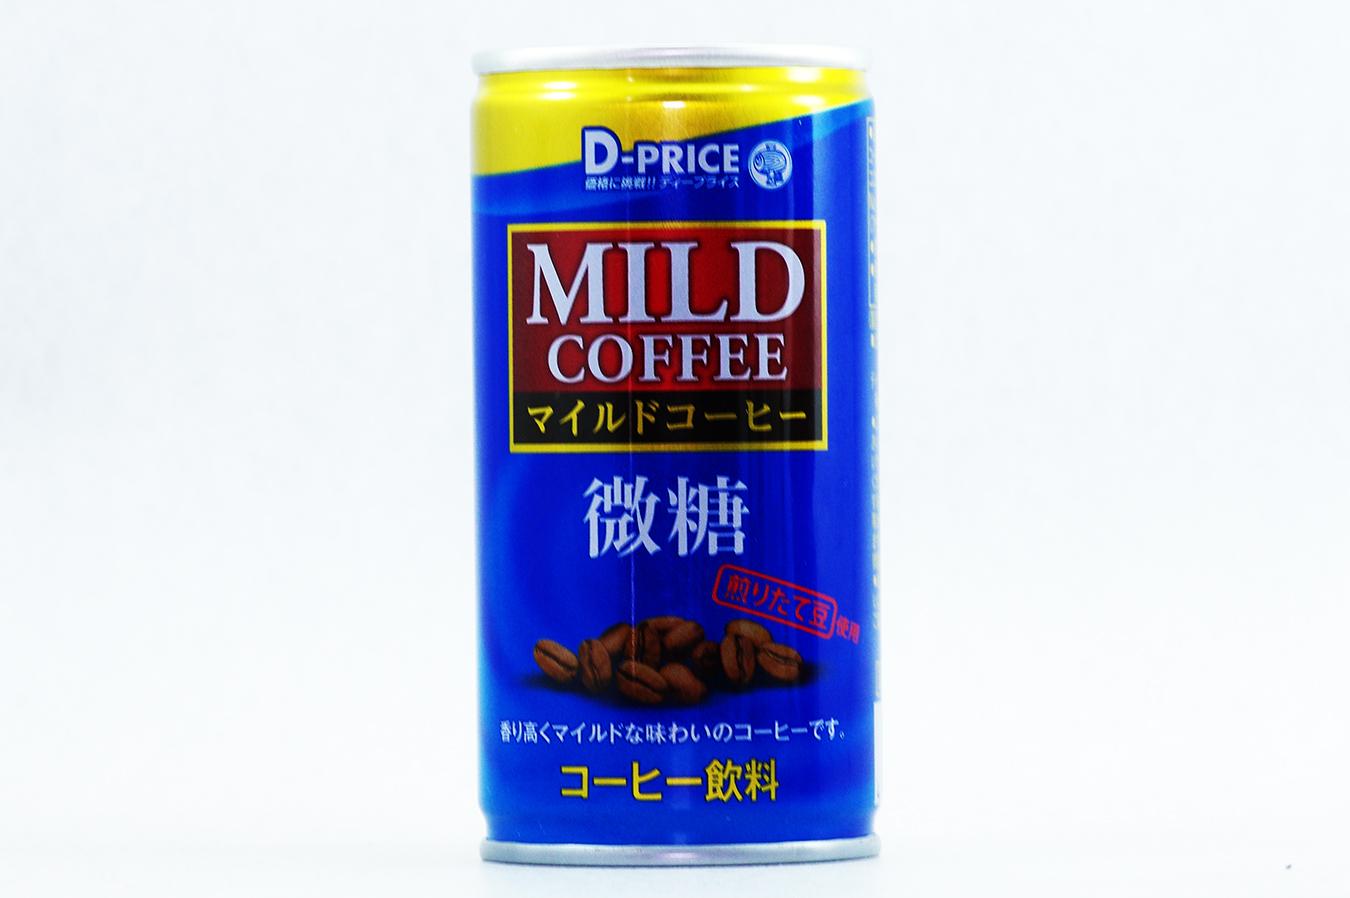 D-PRICE マイルドコーヒー 微糖 2017年11月